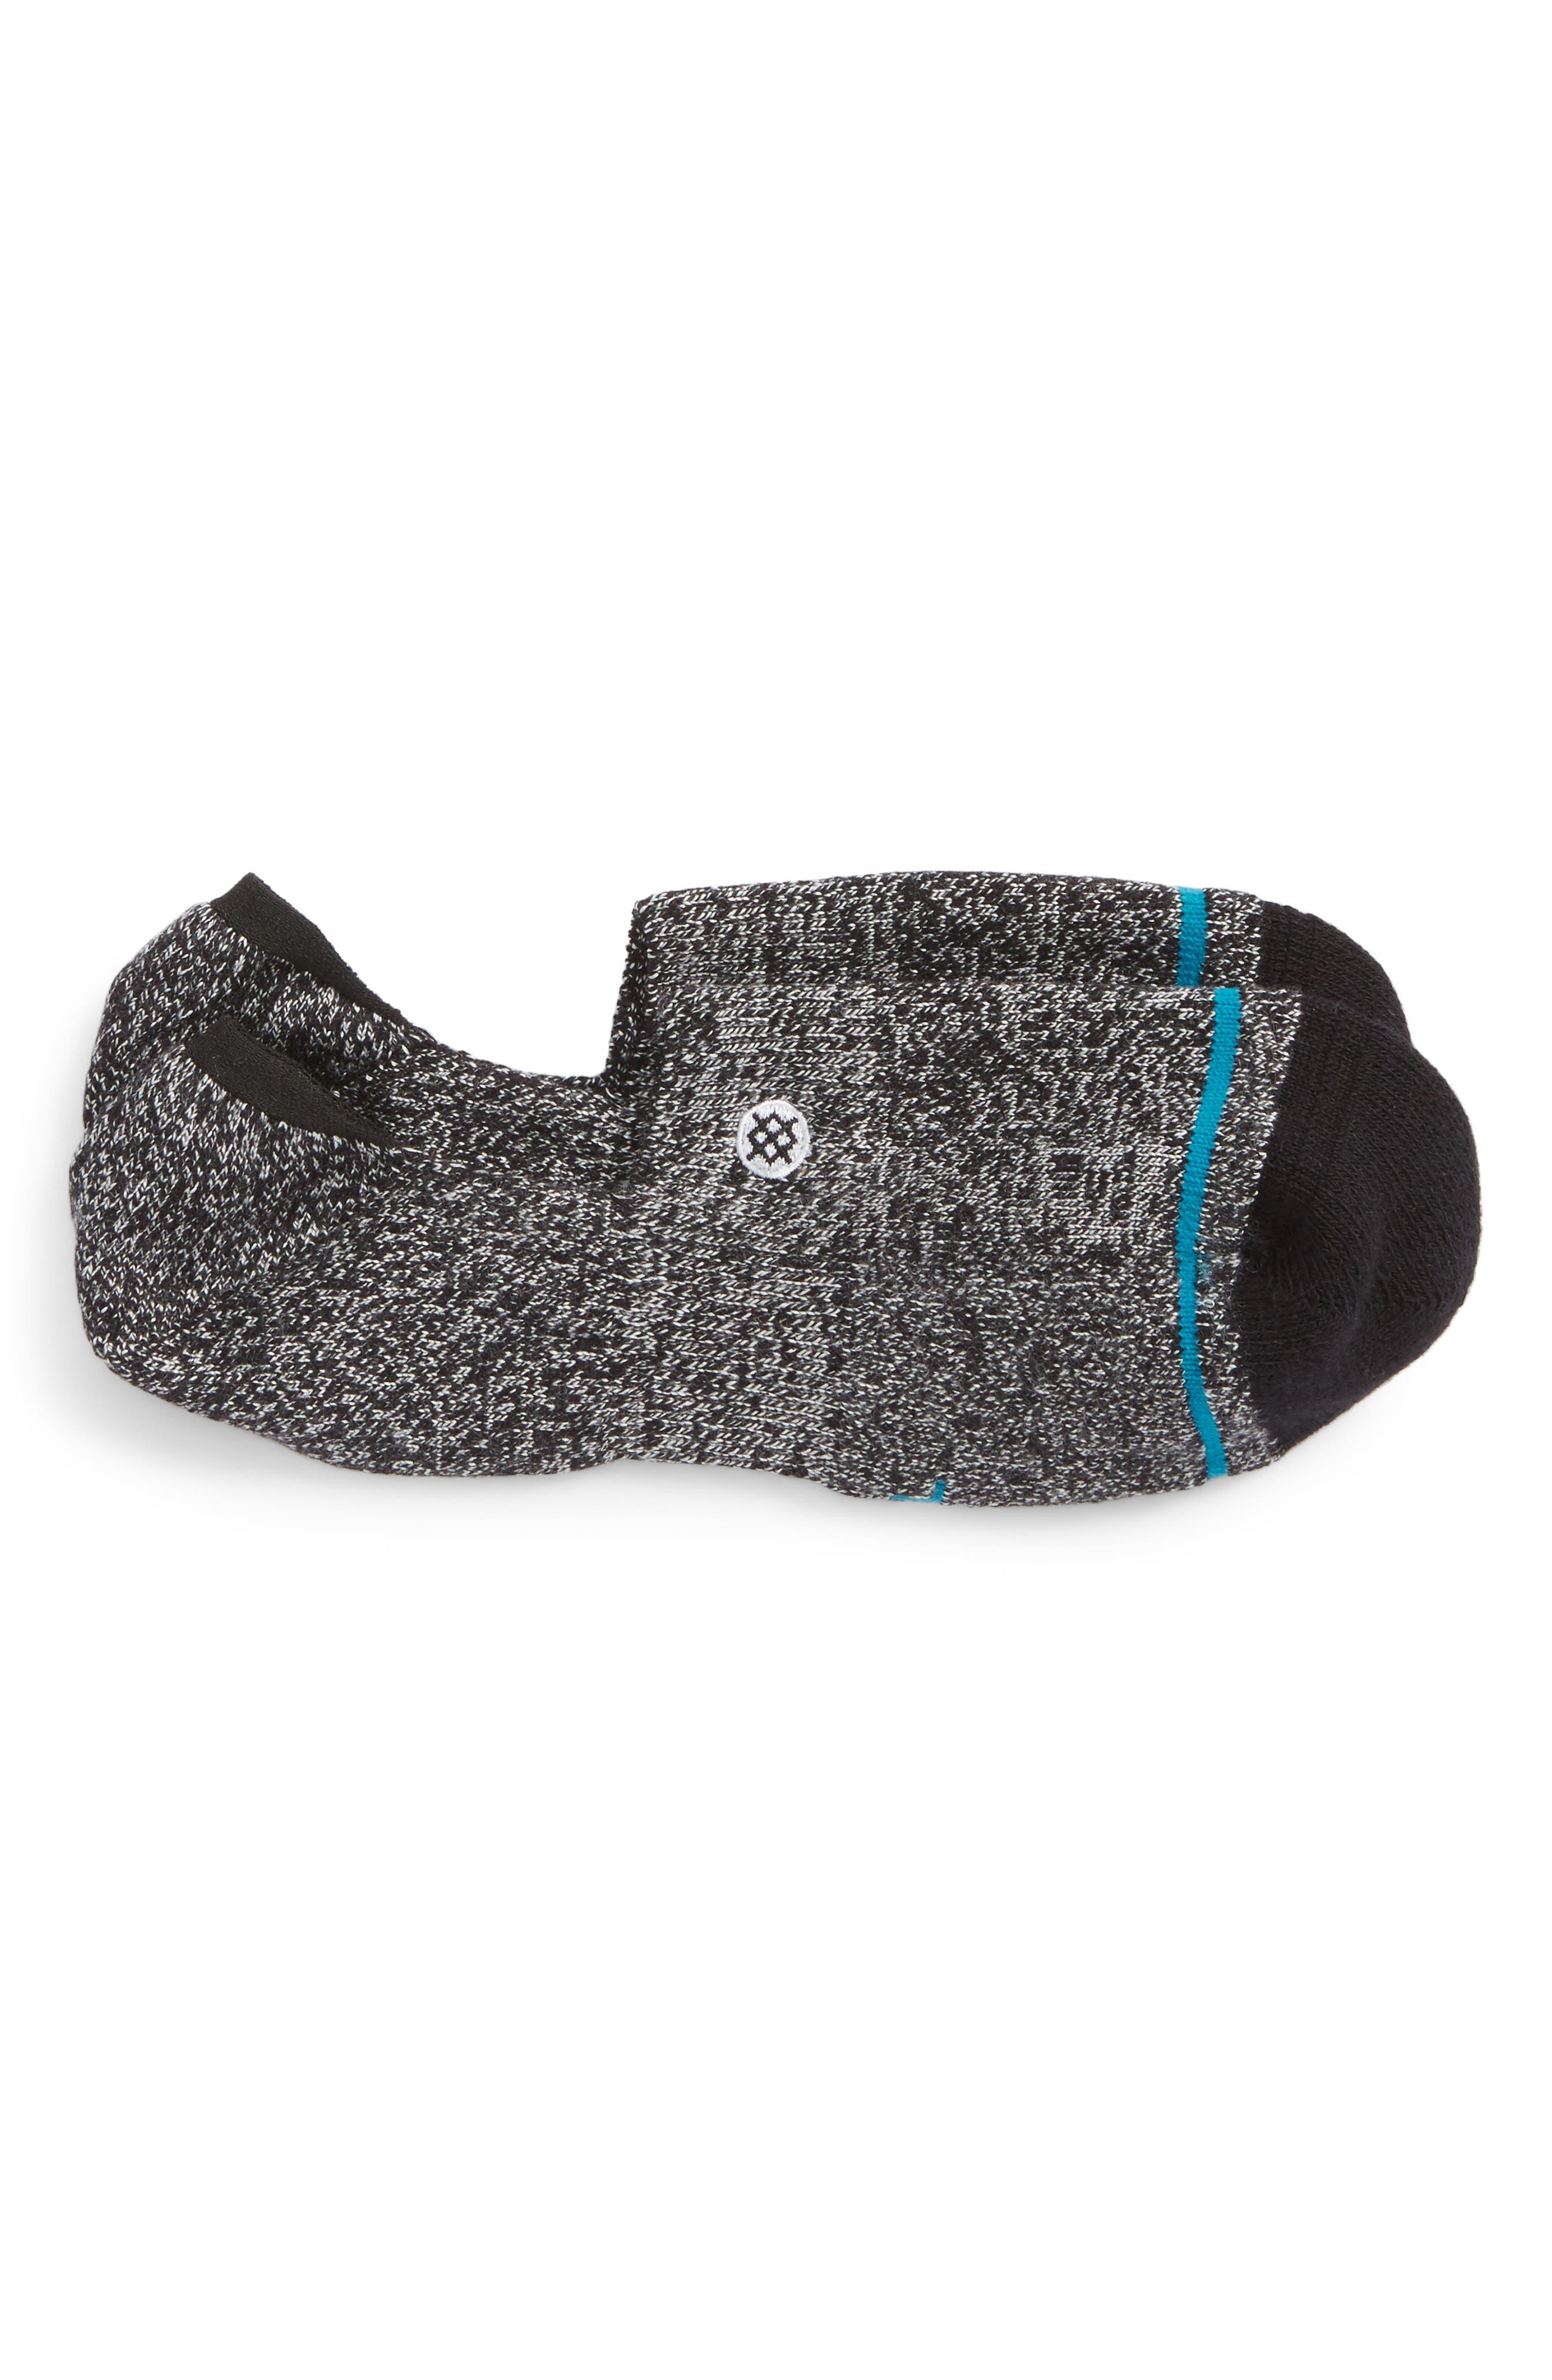 Moore No-Show Socks,                         Main,                         color, BLACK